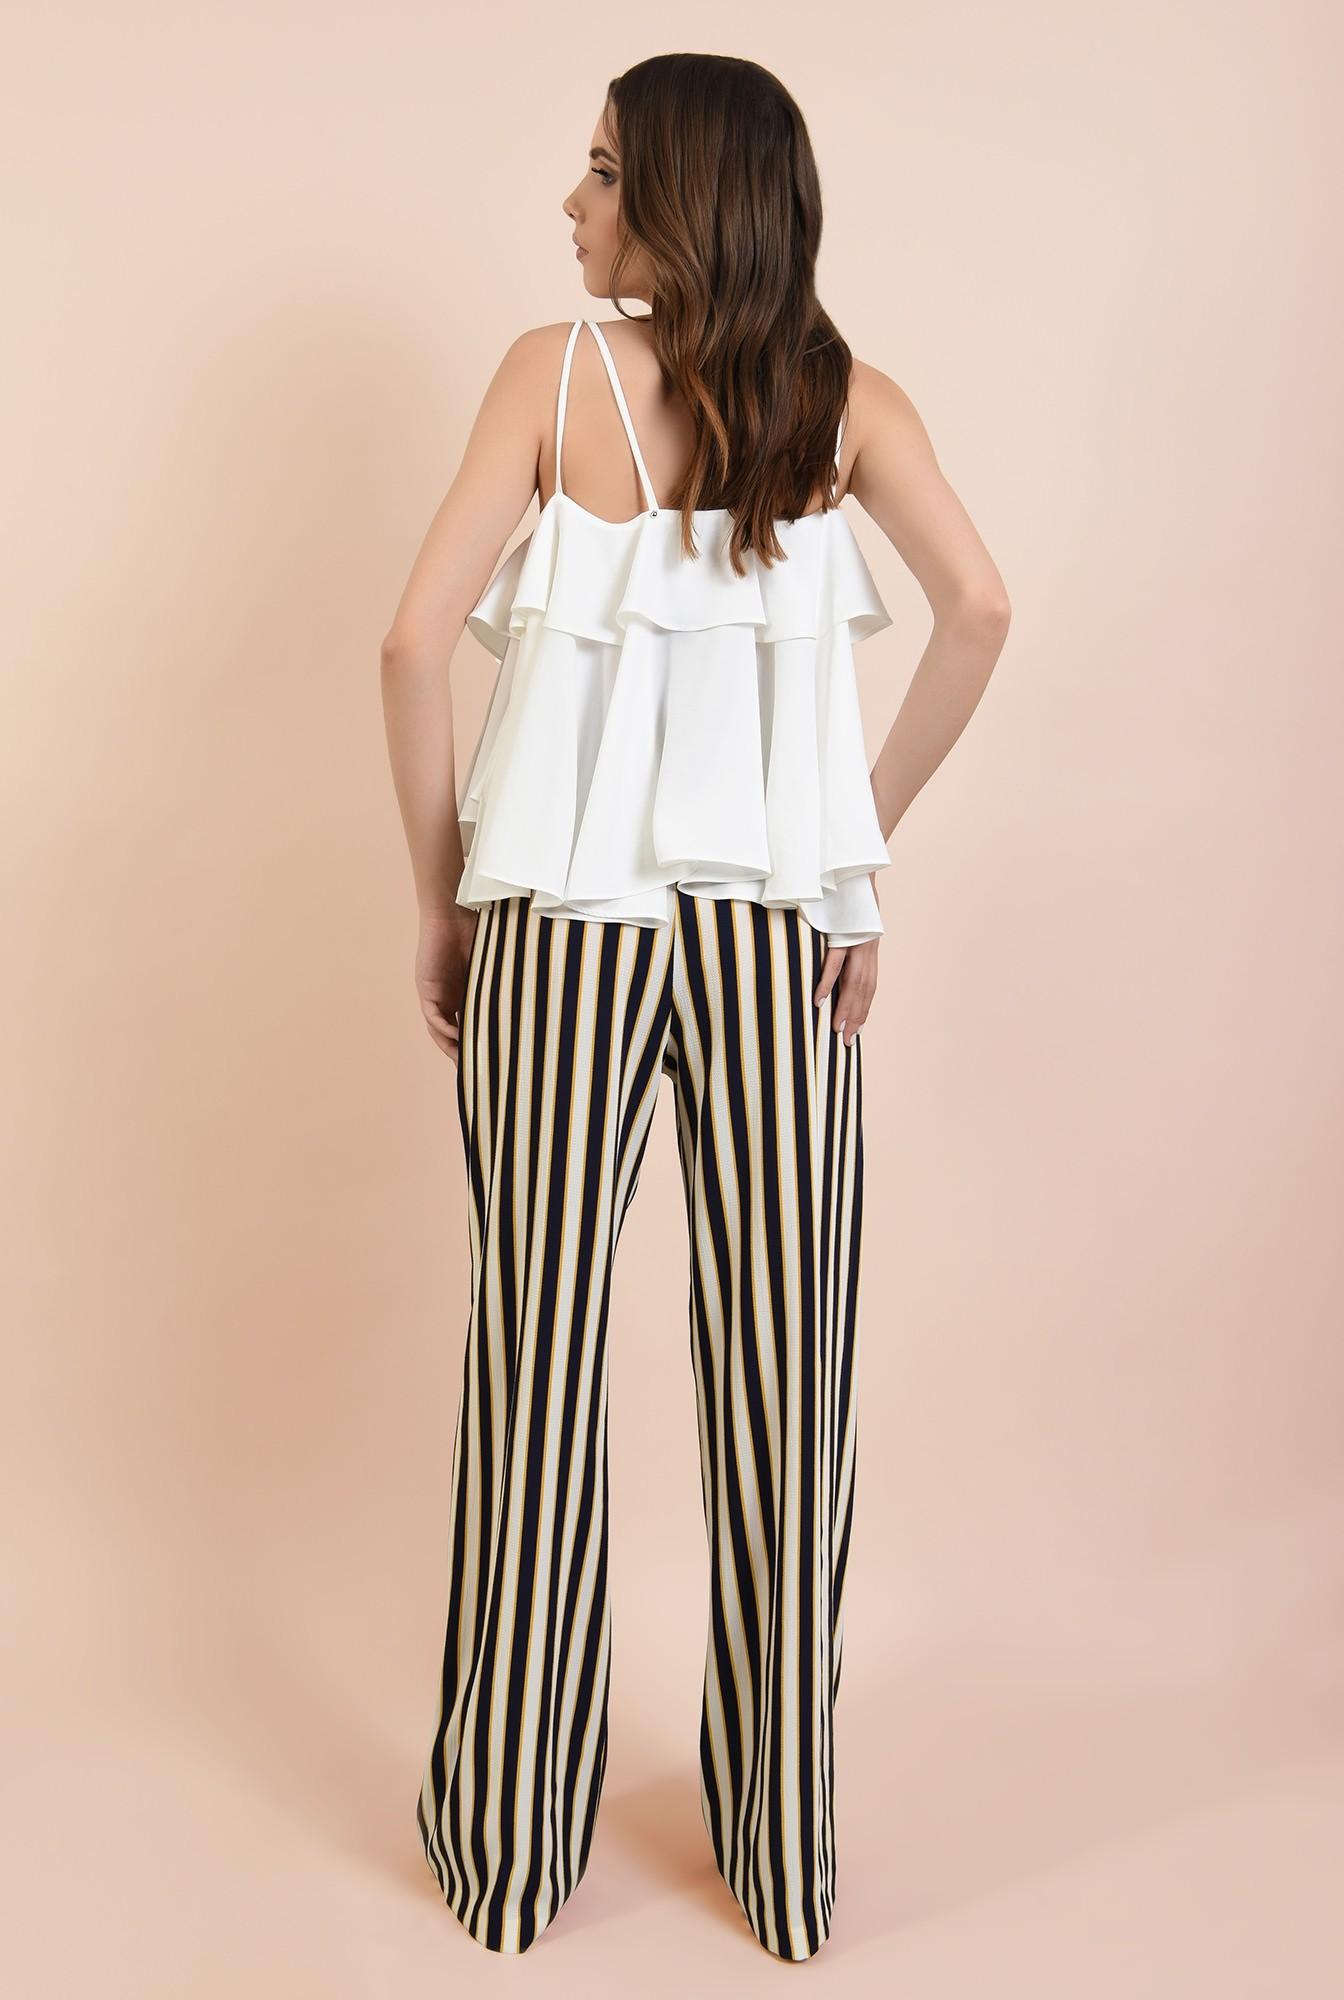 1 - 360 - pantaloni de zi, croi larg, dungi multicolore, betelie elastica